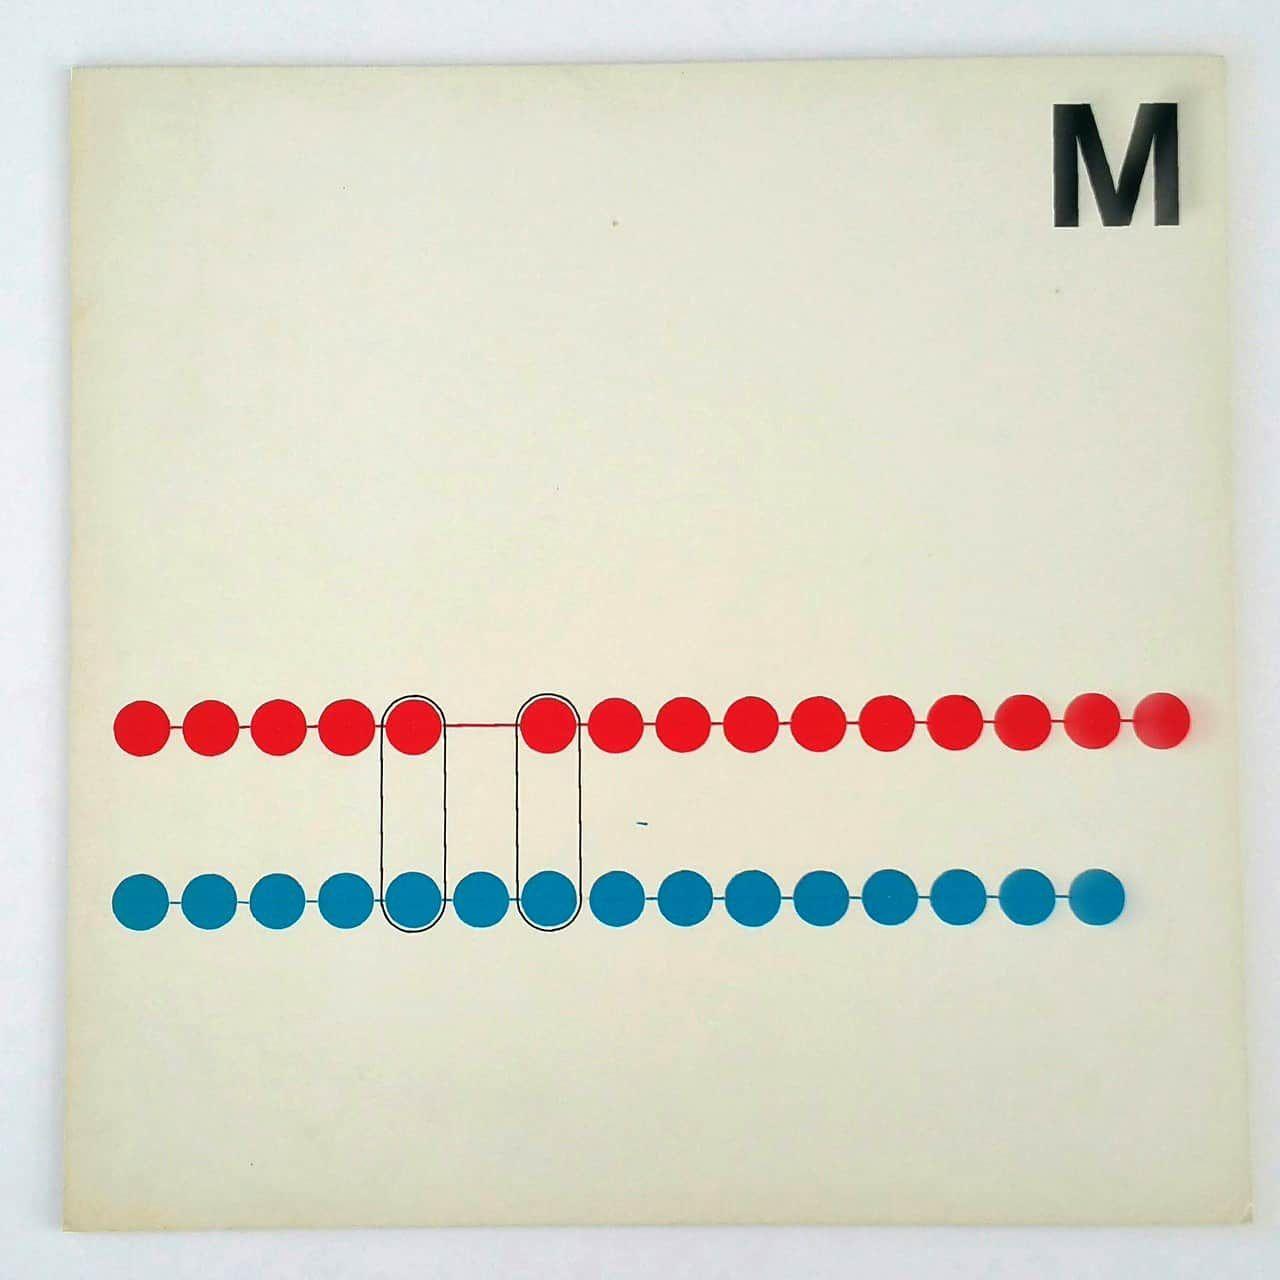 Subway Map Presentation.Dc Metro Subway Map Designs Massimo Vignelli Graphic Design